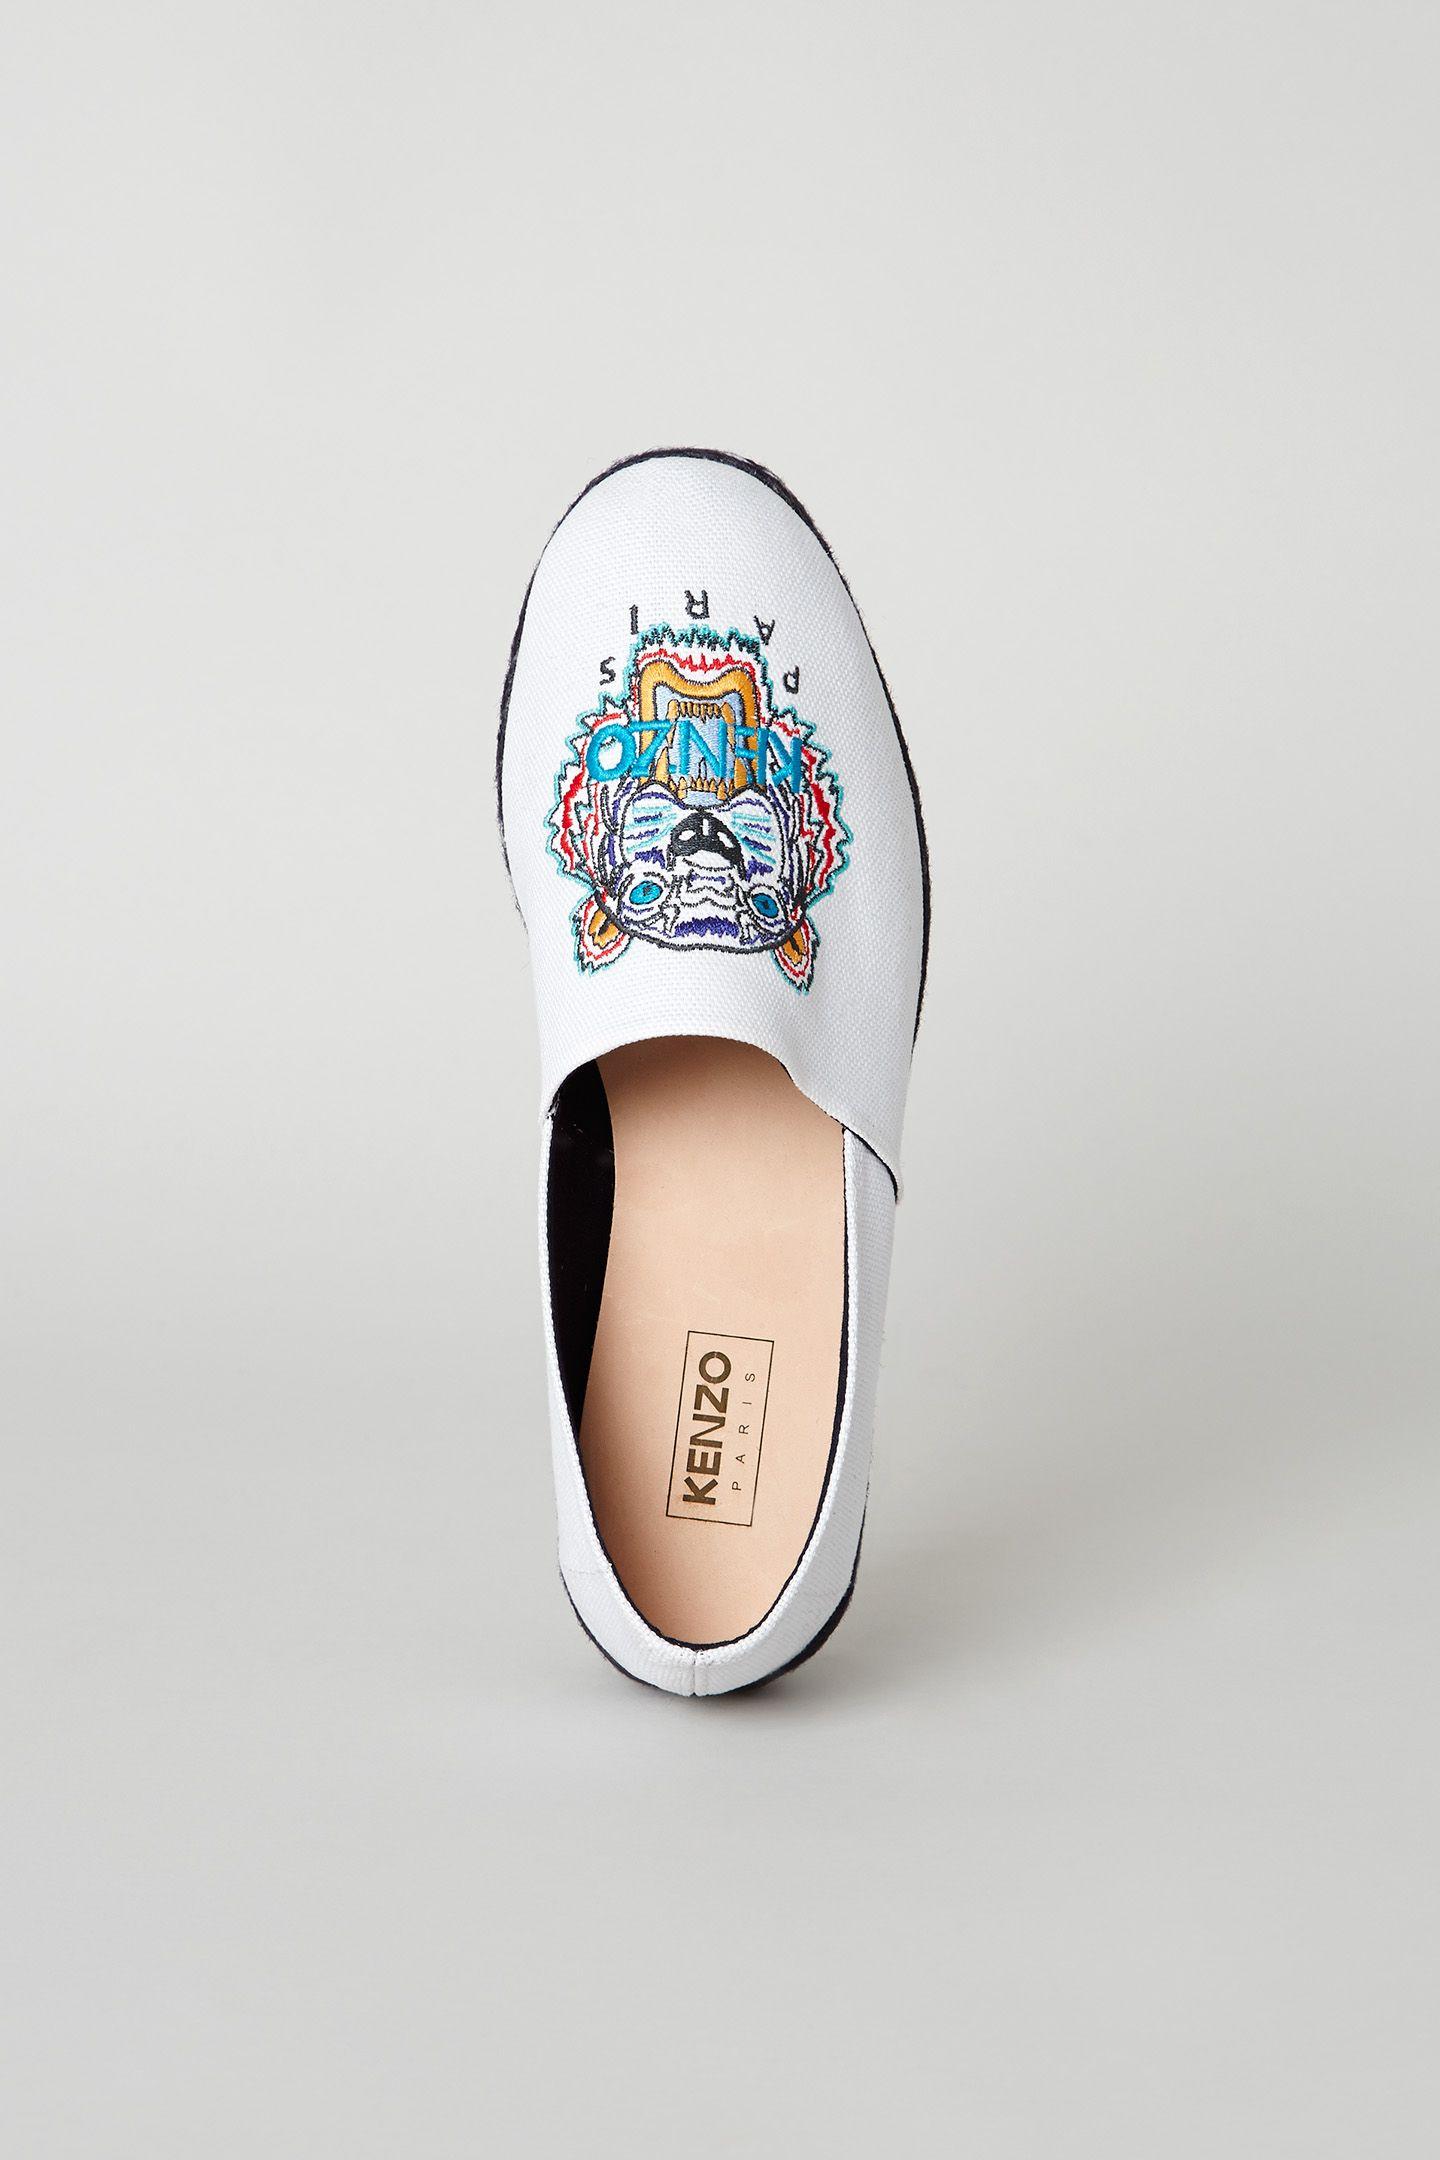 Kenzo Tiger Espadrilles - Kenzo Shoes